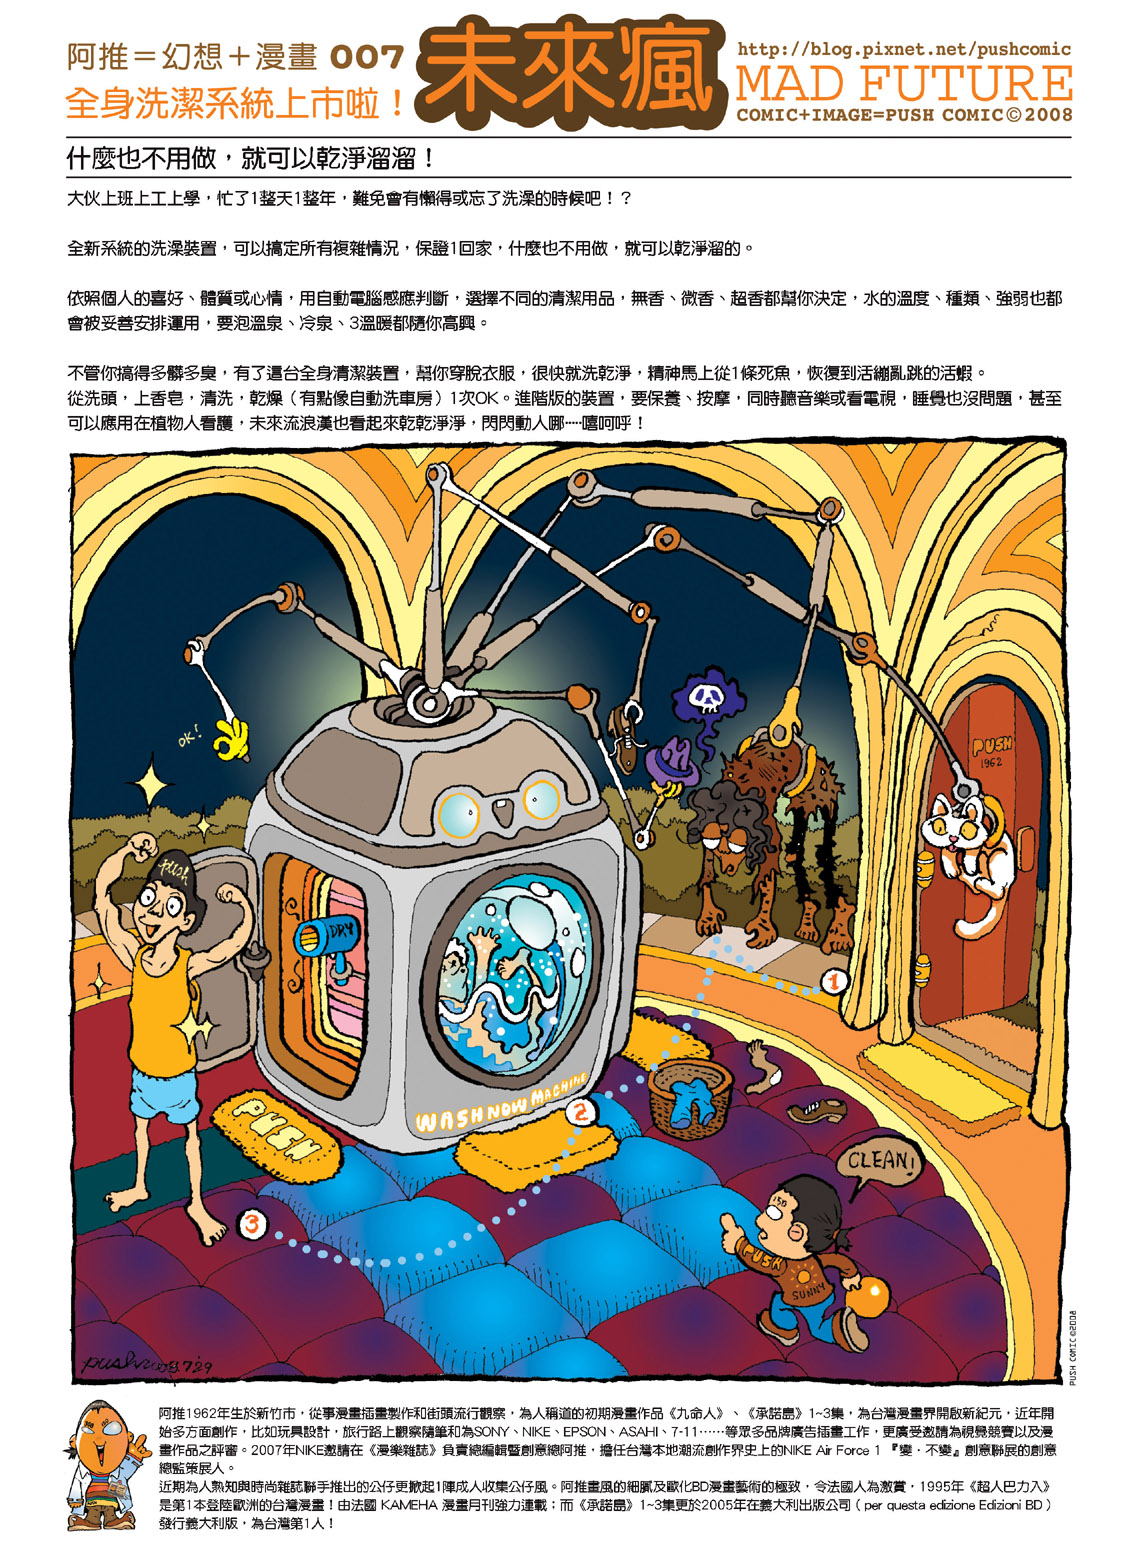 Ming-007-MF-byPUSH-S.jpg